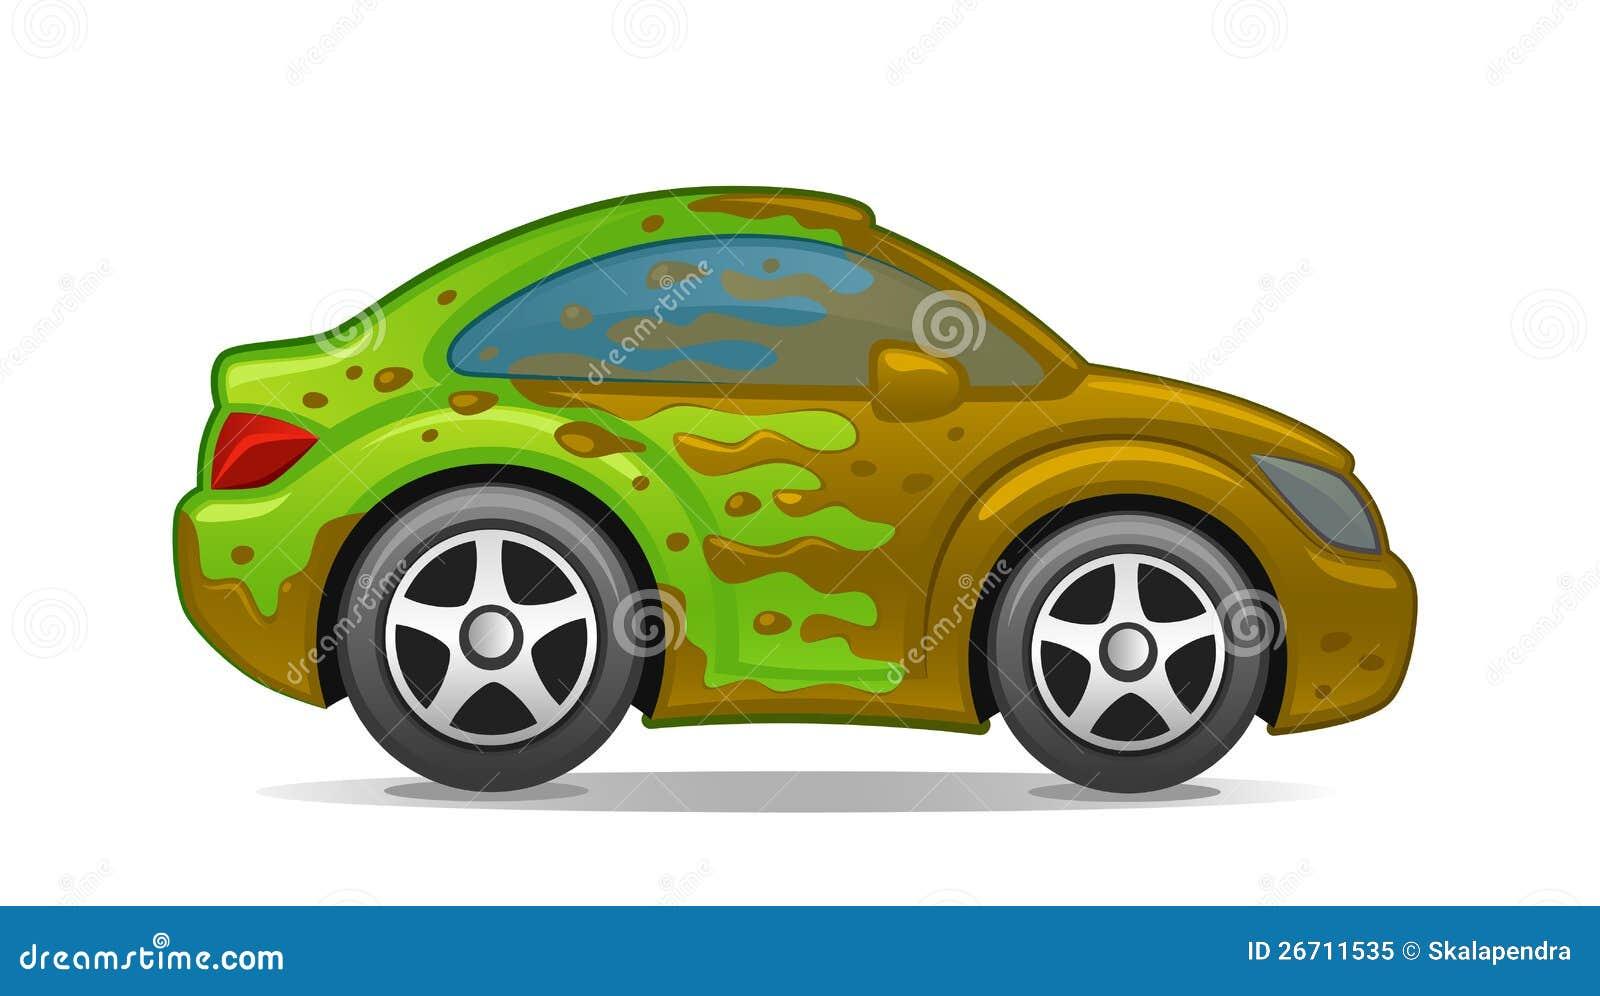 Dirty Car Royalty Free Stock Photo Image 26711535